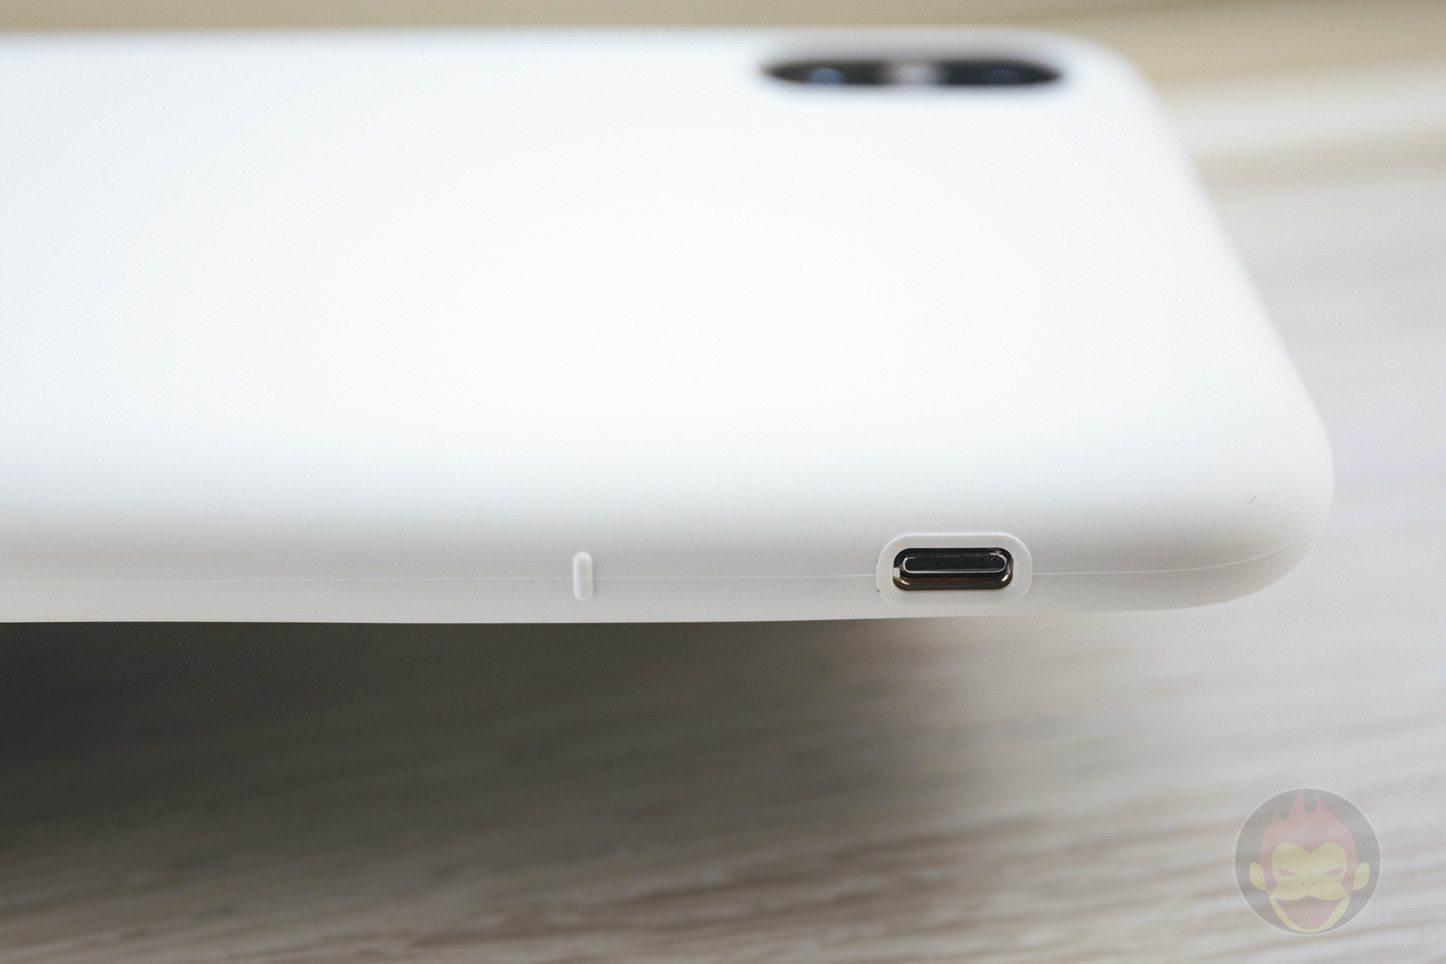 Mynus-iPhoneX-Case-Black-White-04.jpg